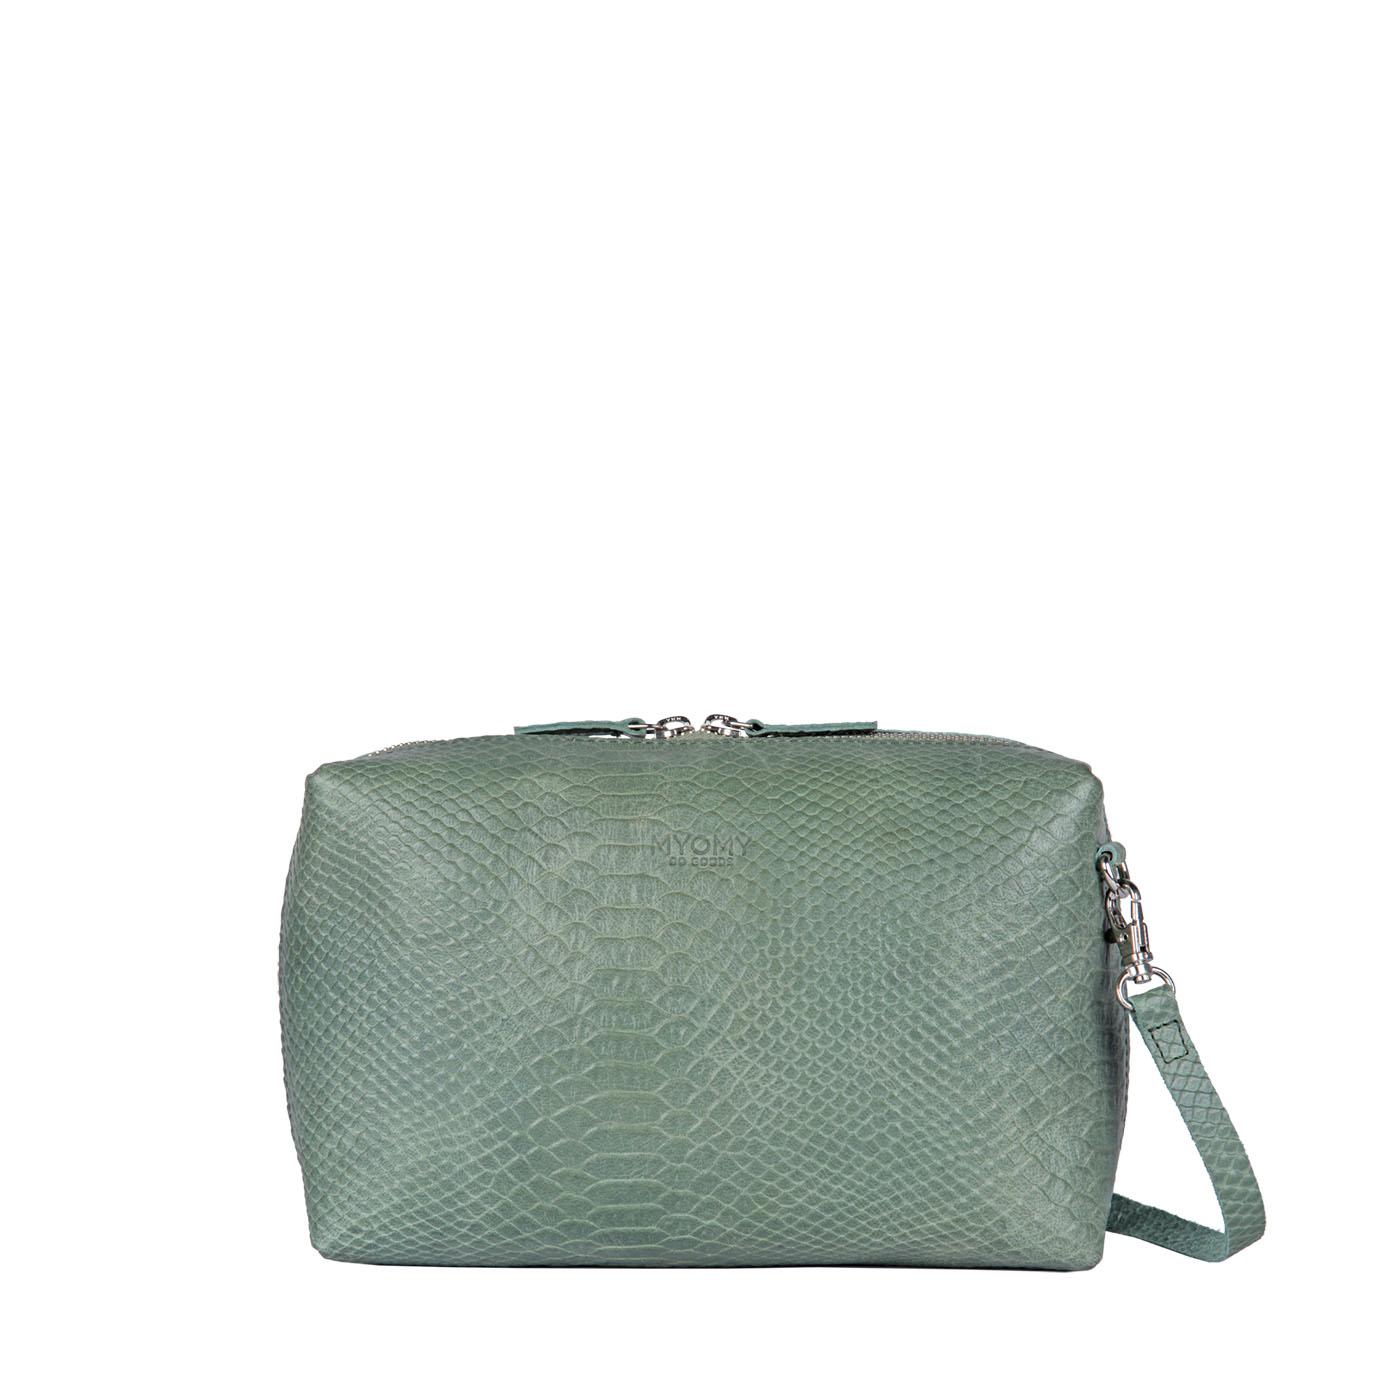 MY BOXY BAG Workbag - anaconda sea green